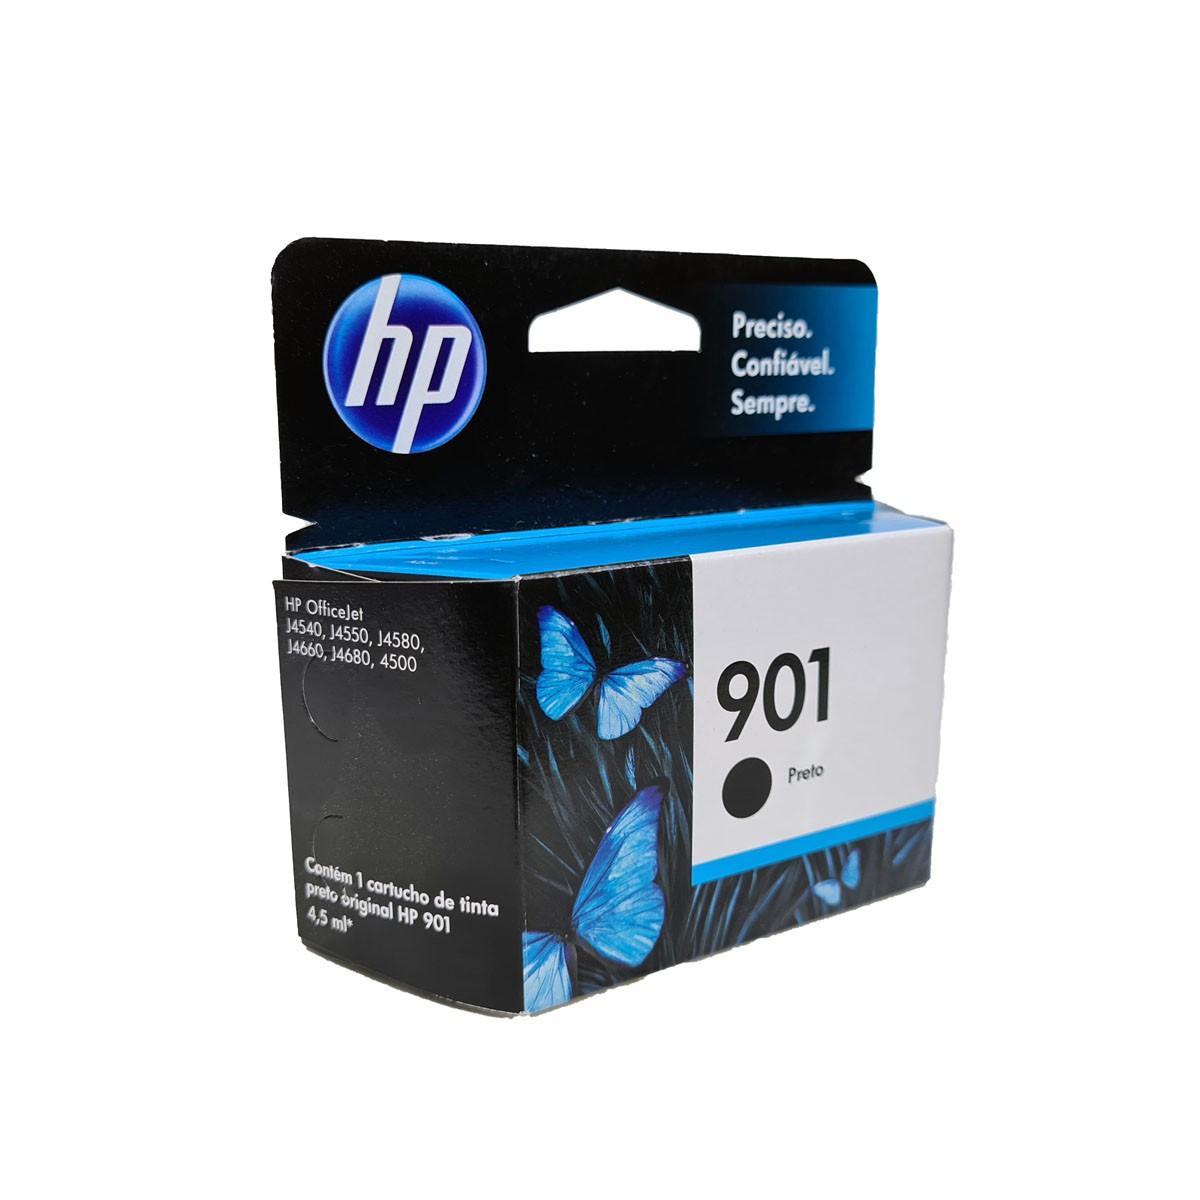 Cartucho HP 901 CC653AB CC653AL Preto para J4540 J4550 J4580 J4500 J4660 J4680